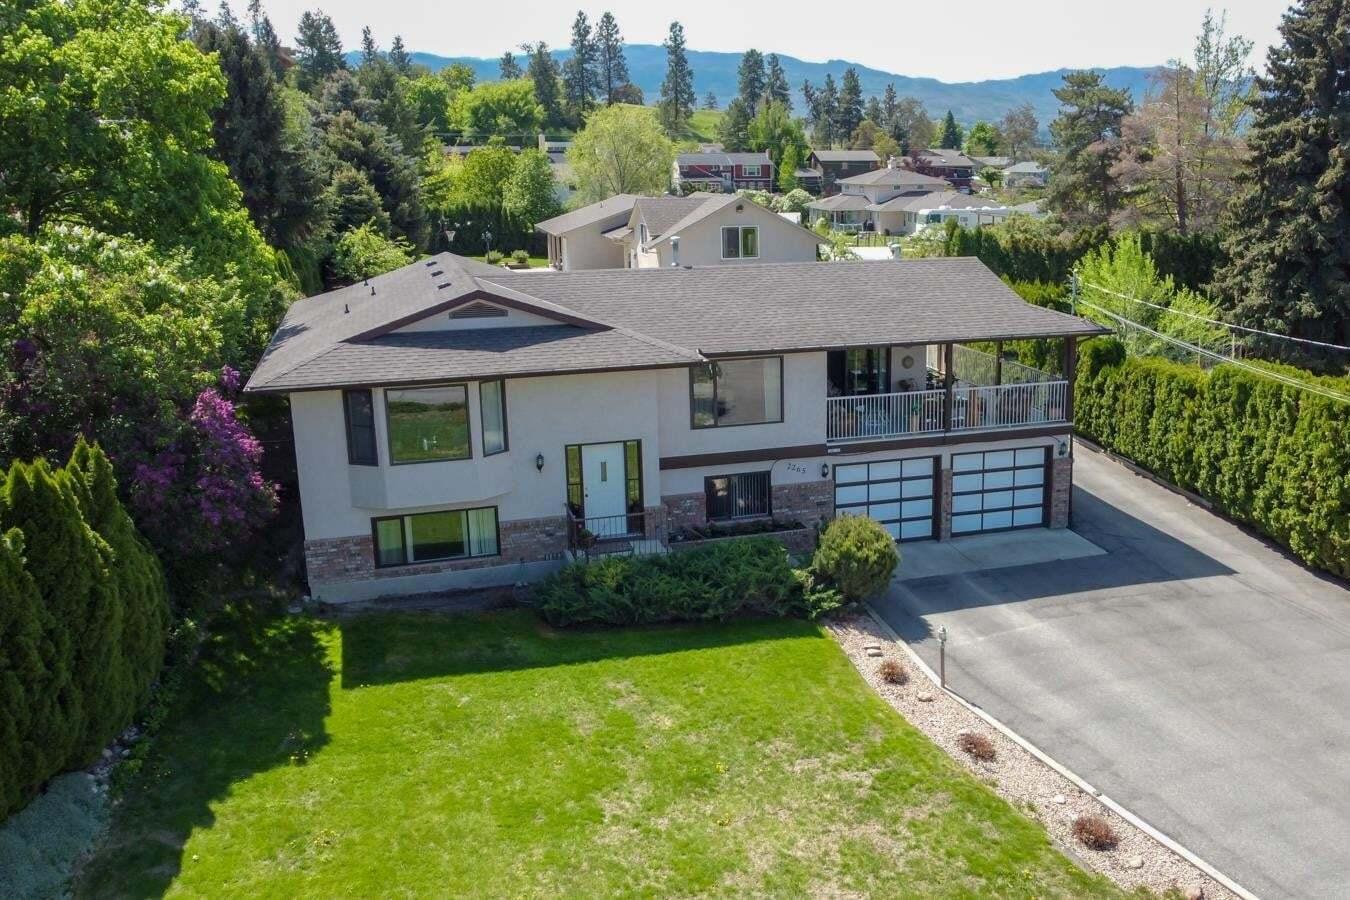 House for sale at 2265 James Rd Kelowna British Columbia - MLS: 10204839